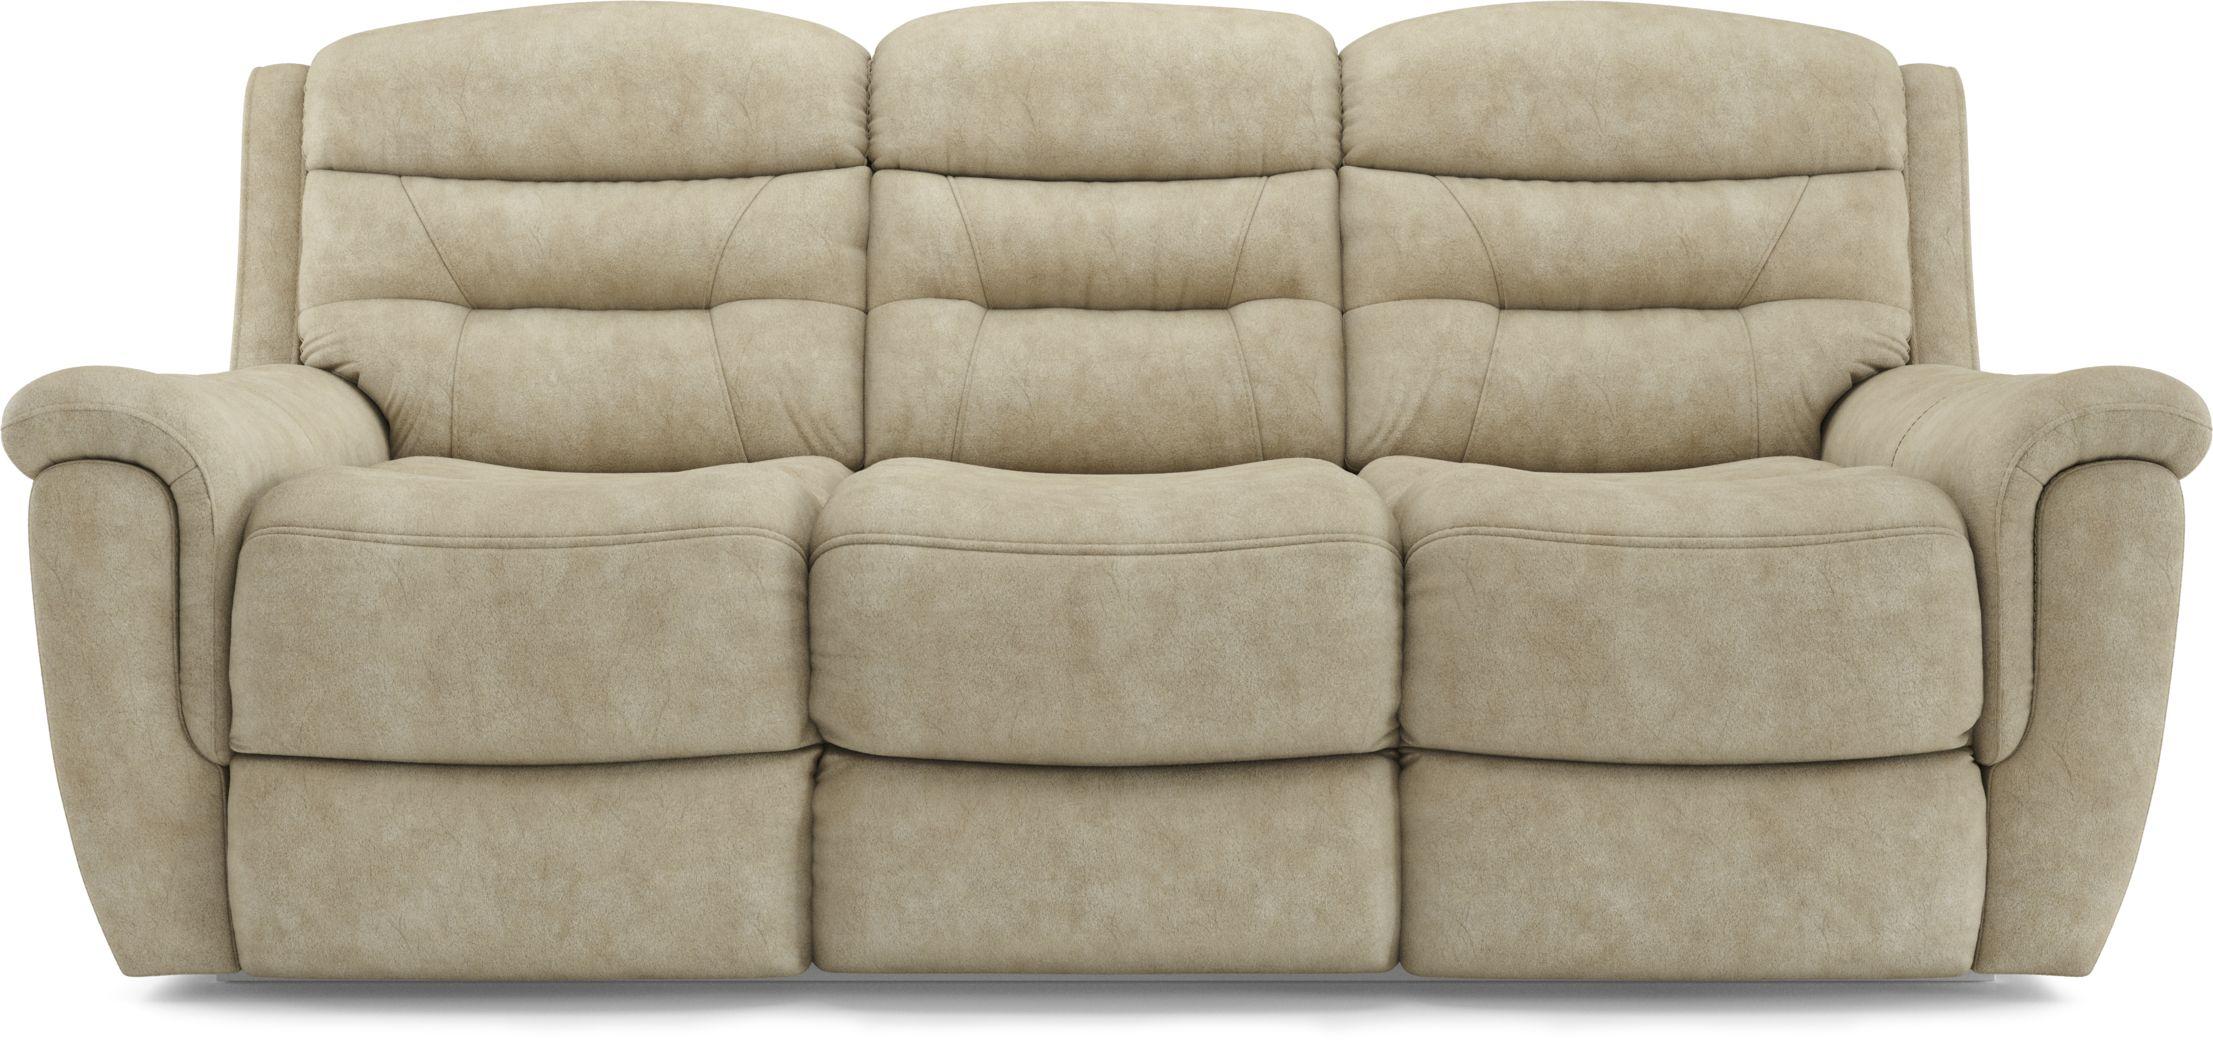 Halton Hills Sand Power Reclining Sofa